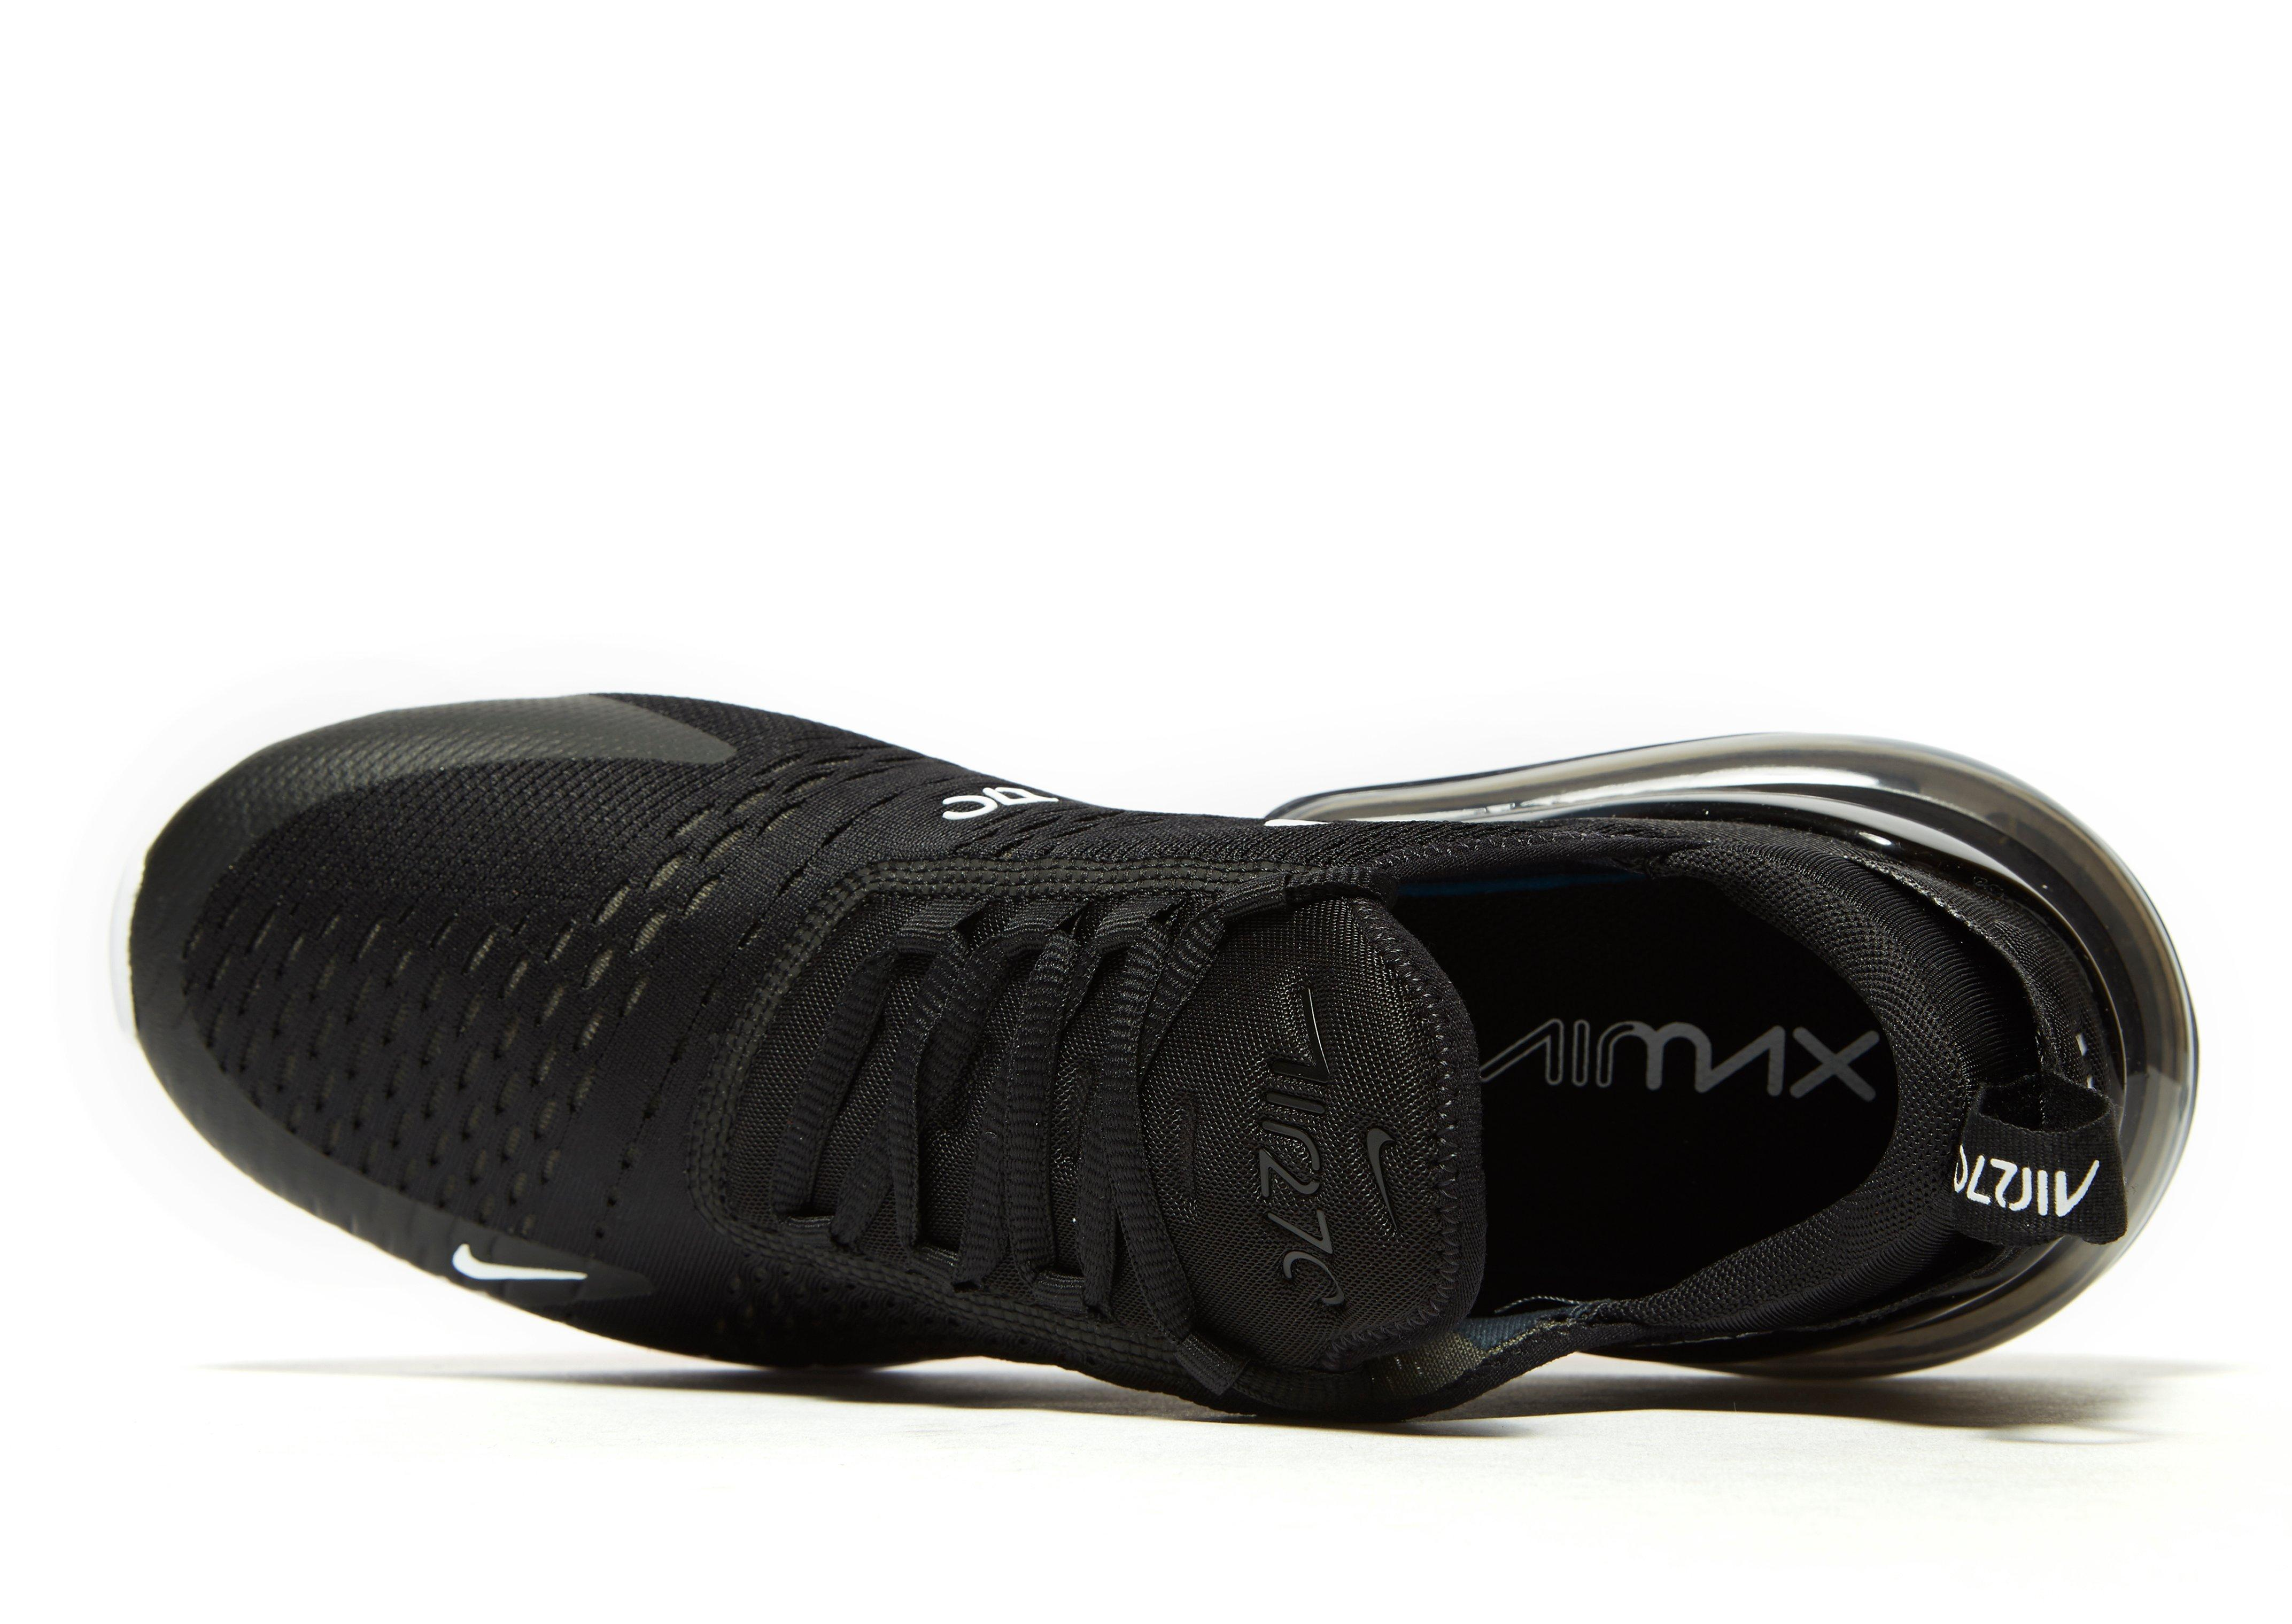 691761454ae41 Nike Outlet Phoenix Amazing Shoes